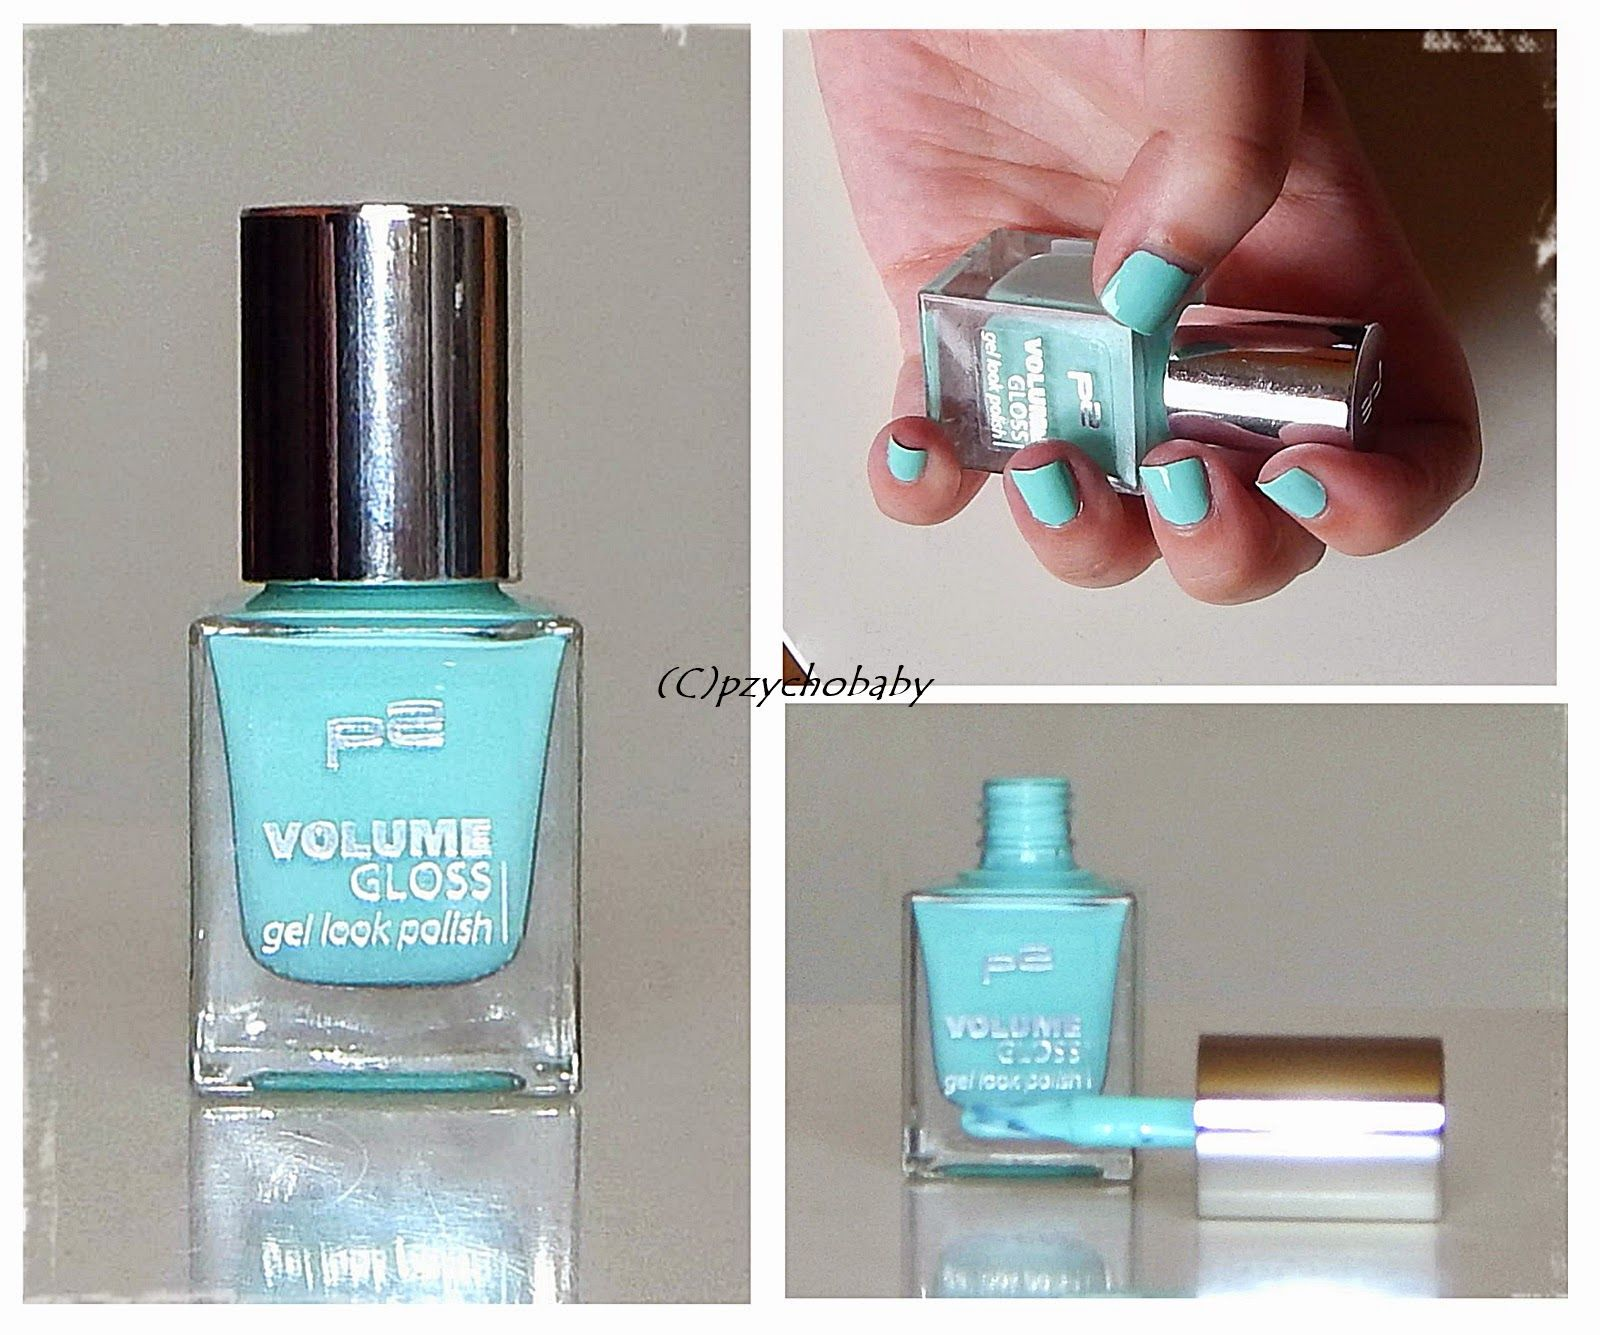 p2 VOLUME GLOSS gel look polish - 031 minty mademoiselle   Munich ...